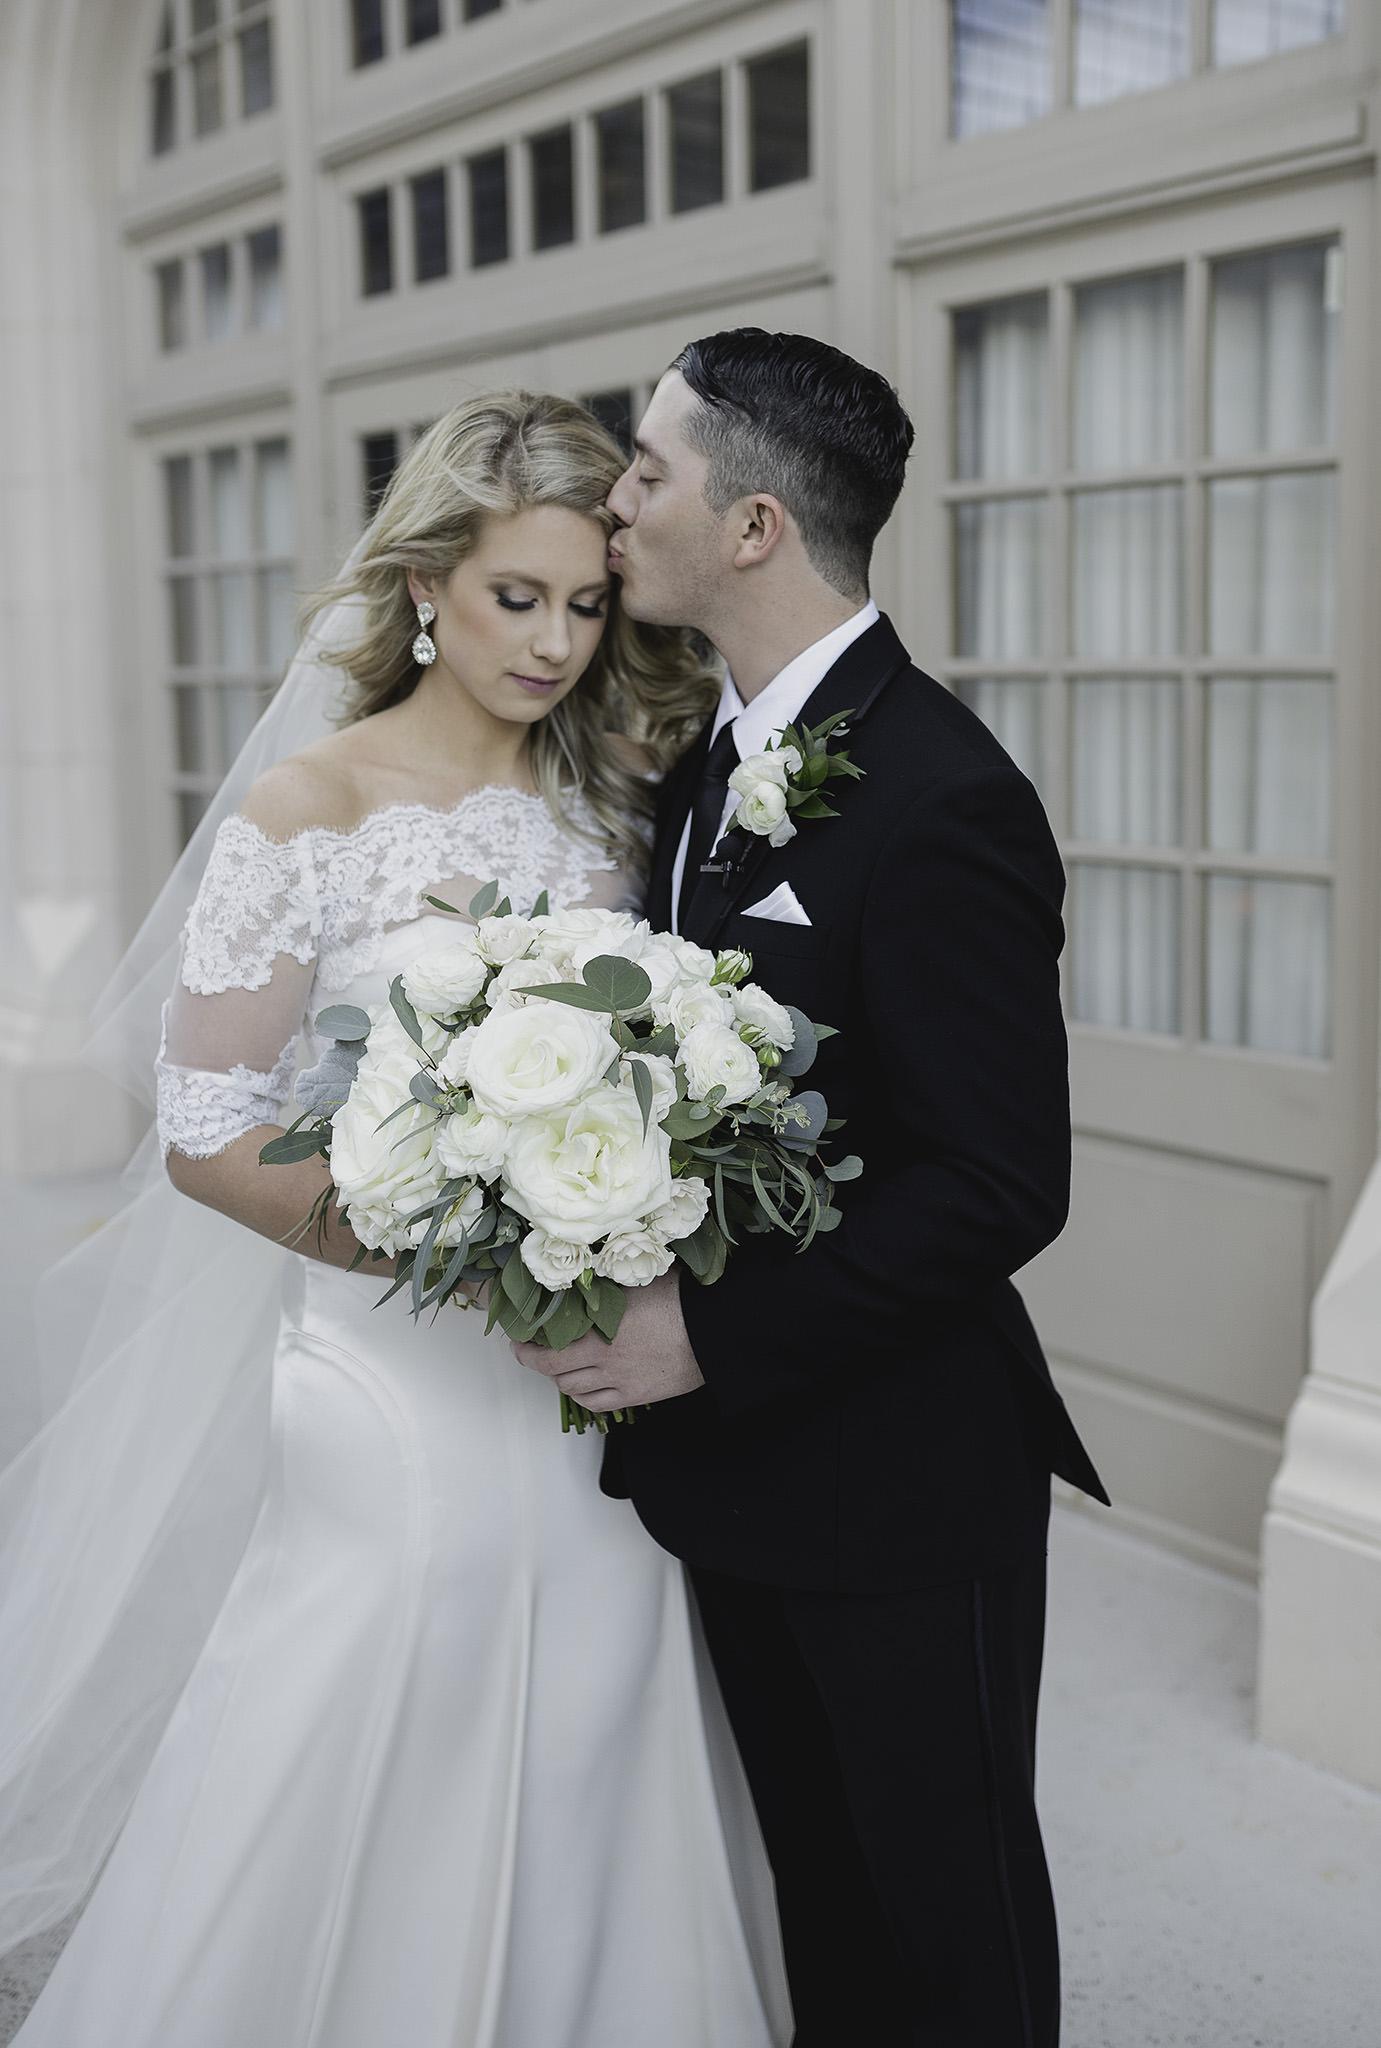 Claire-Travis-Classy-artistic-Downtown-Houston-Rice-ballroom-wedding-sm-009.jpg